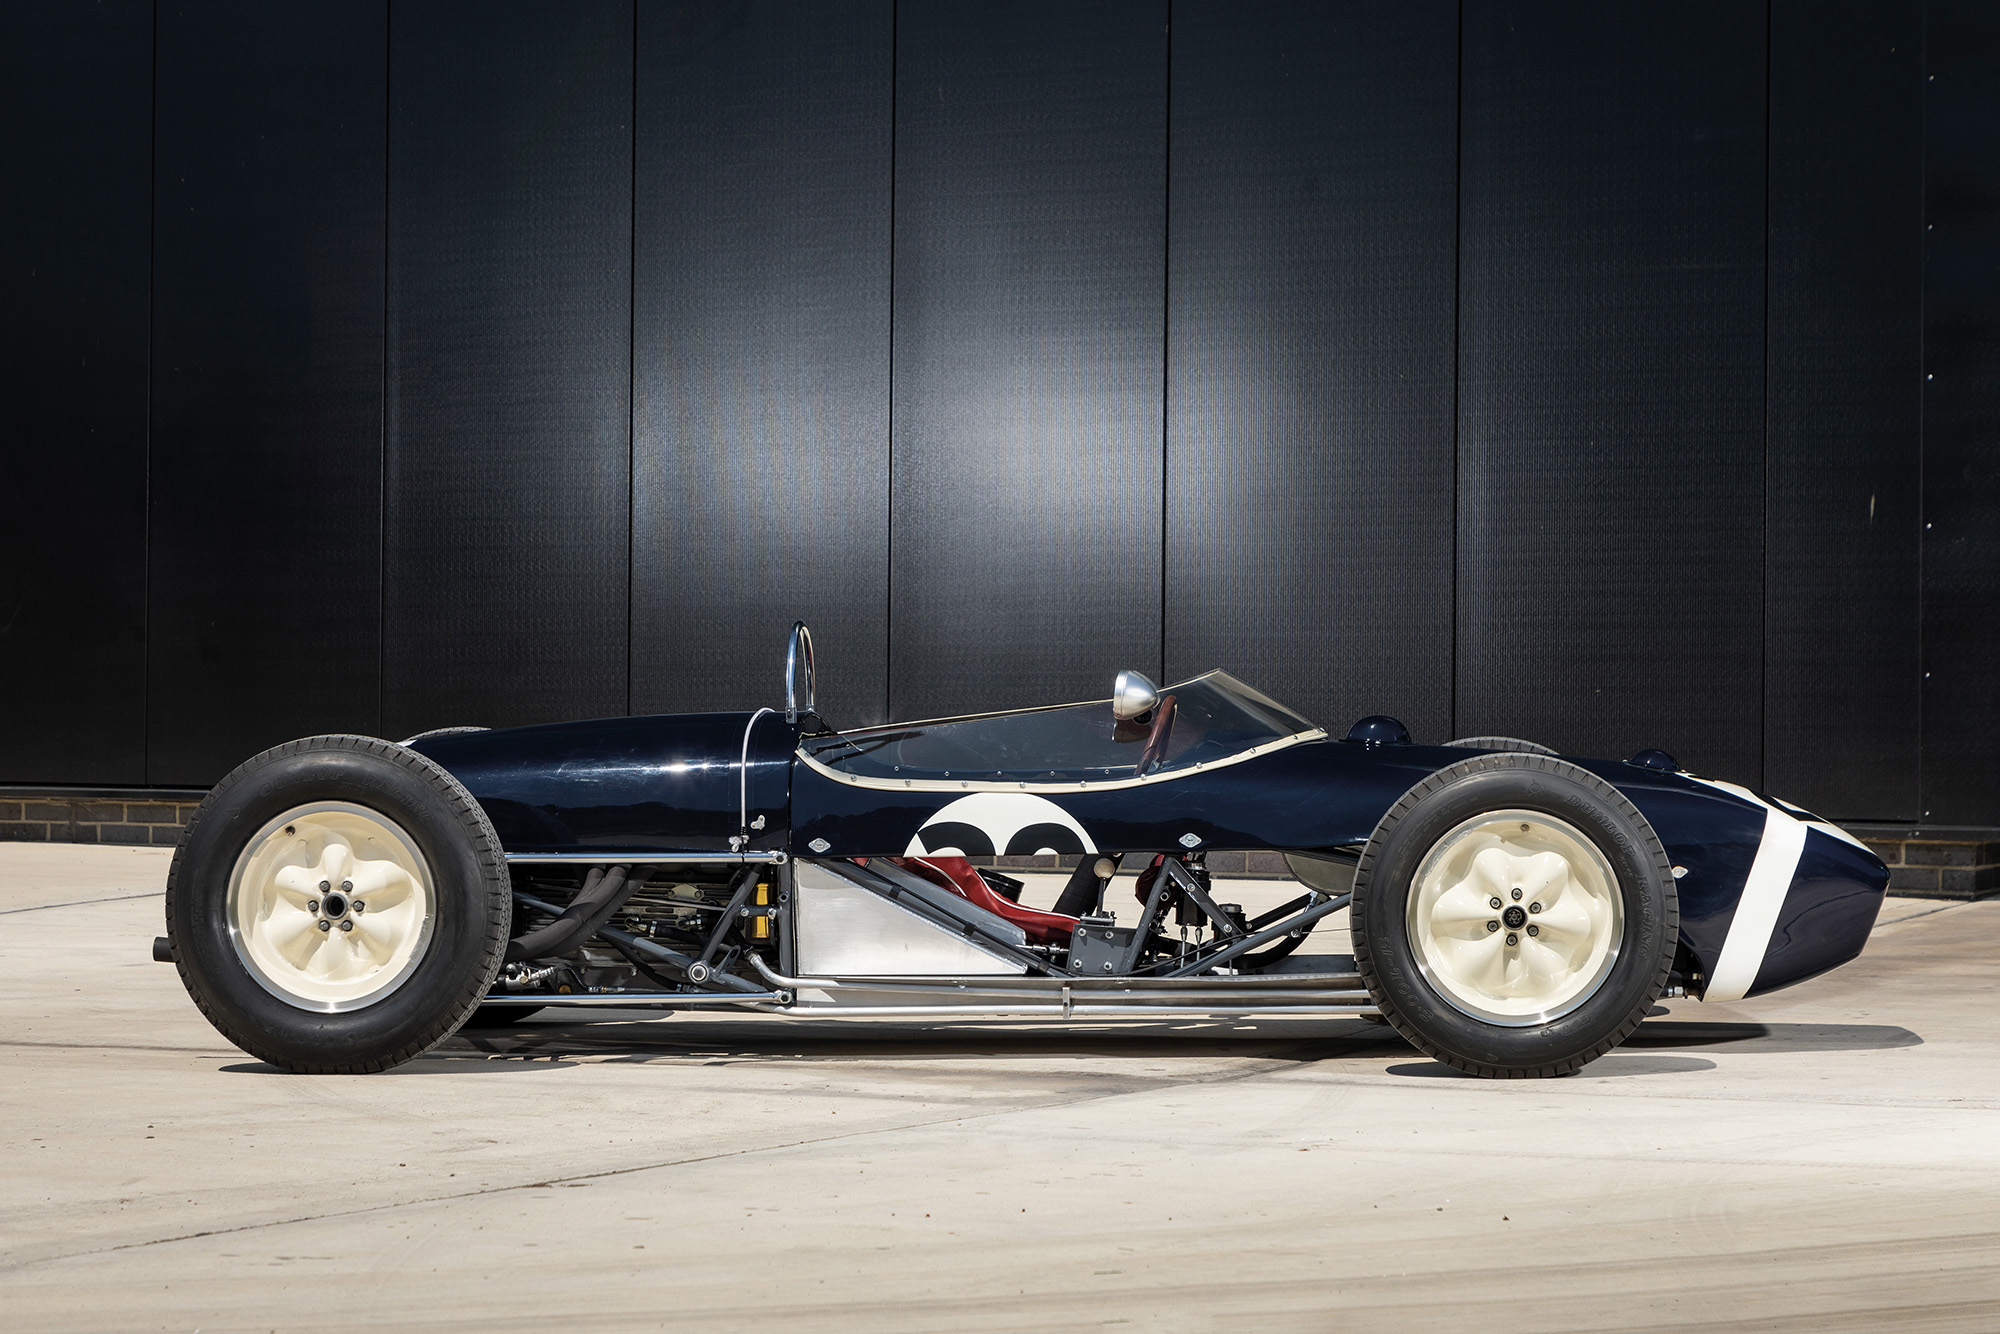 1961 Stirling Moss Monaco winning Lotus 18 side